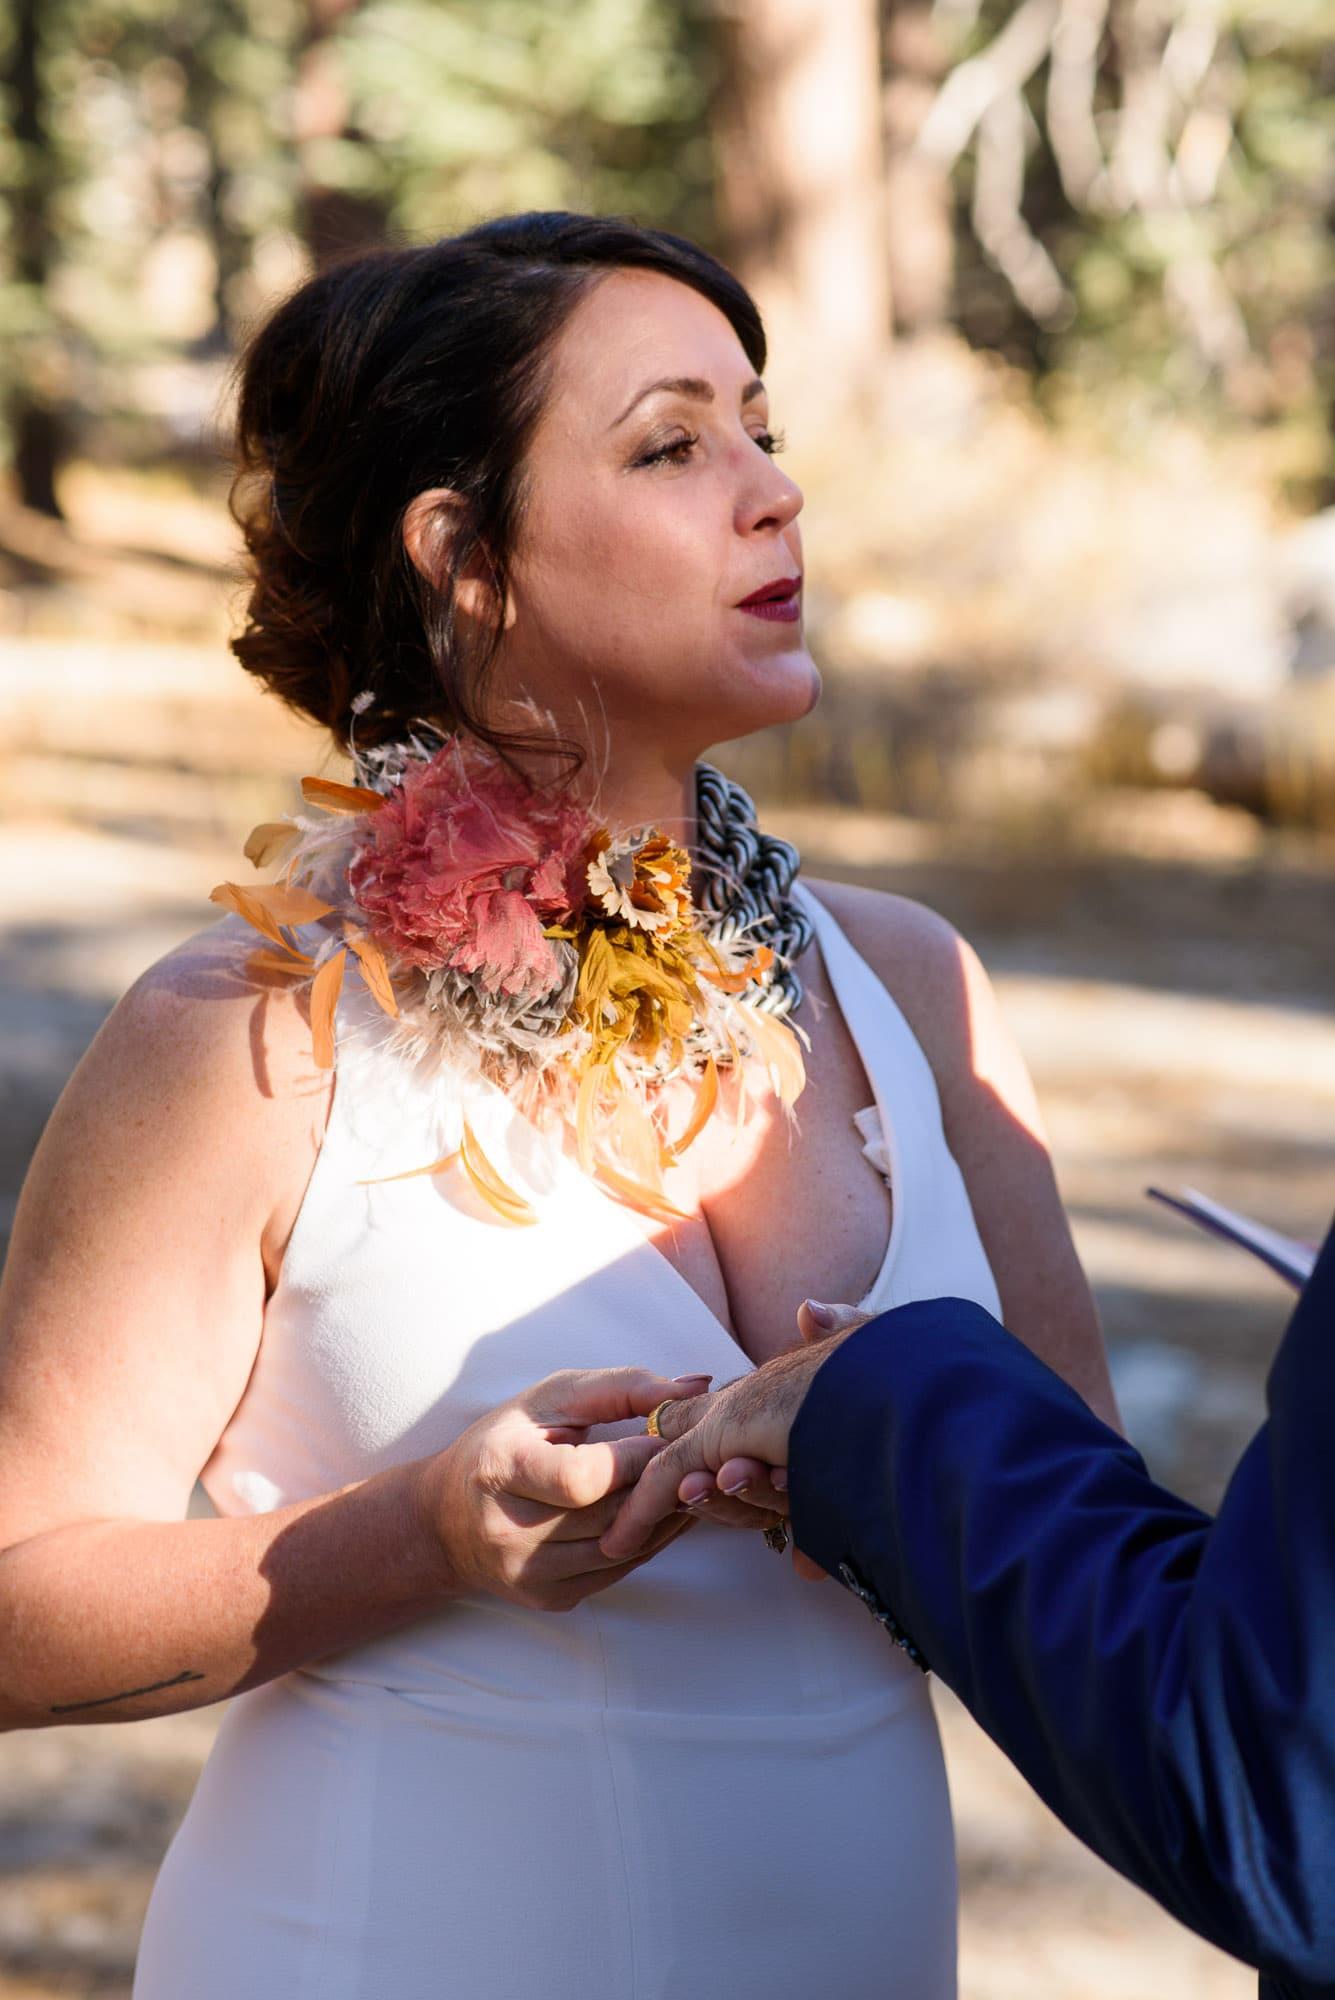 024_Alan_and_Heidi_Palm_Springs_Tram_Wedding